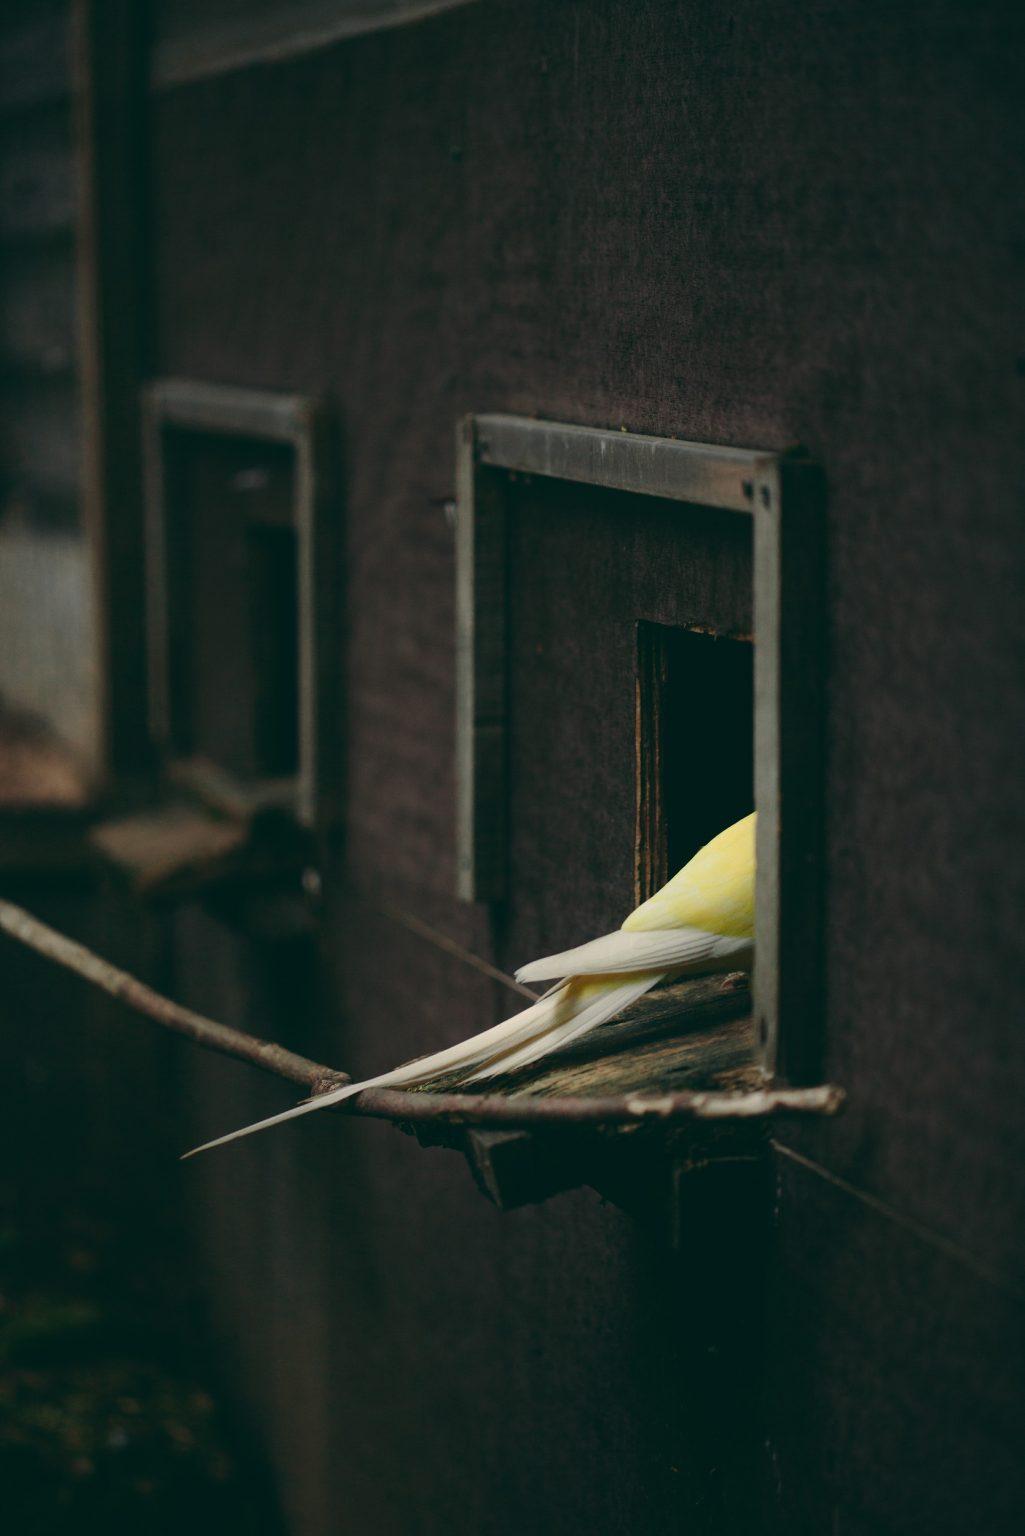 Bonneuil-Matours, France, May 2017 - La Maison Neuve. The yellow plumage of Belle-bête is an anomaly in the world of ring-necked parakeets, which are usually green and blue. She lives together with two cockatiels, with which she has fluctuating dominance relationships. >< Bonneuil-Matours, Francia, maggio 2017 - La Maison Neuve. Il piumaggio giallo di Belle-bête è un'anomalia nel mondo dei parrocchetti dal collare, che di solito sono verdi e blu. Vive insieme a due calopsiti, con i quali ha rapporti di dominanza fluttuanti.*** SPECIAL   FEE   APPLIES *** *** Local Caption *** 01489345